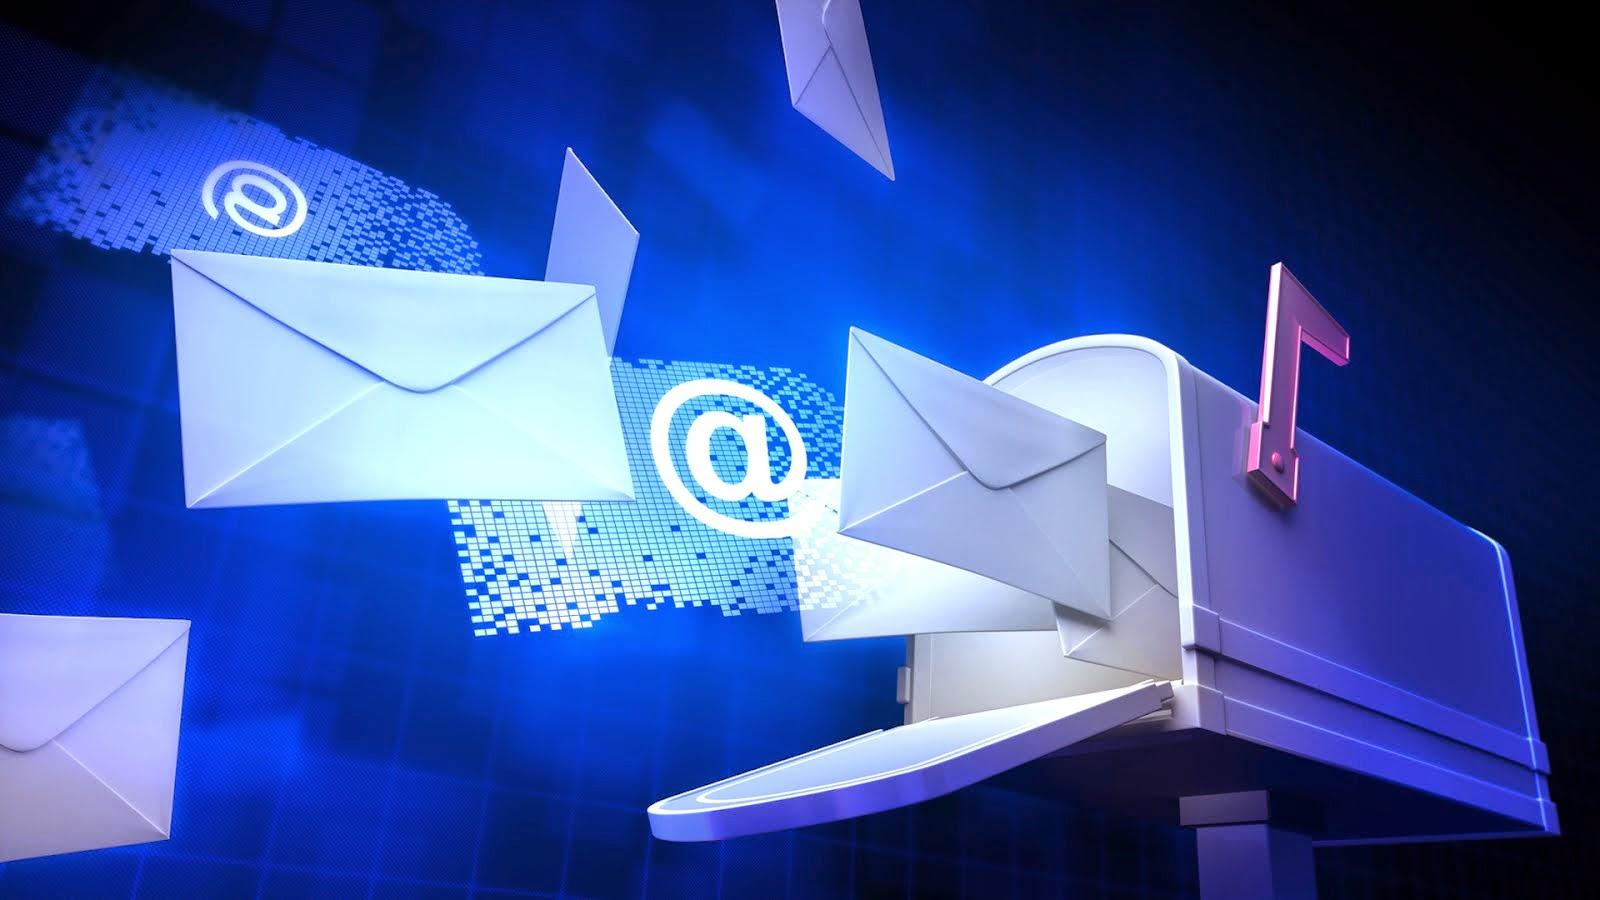 E-mail Mundotoku